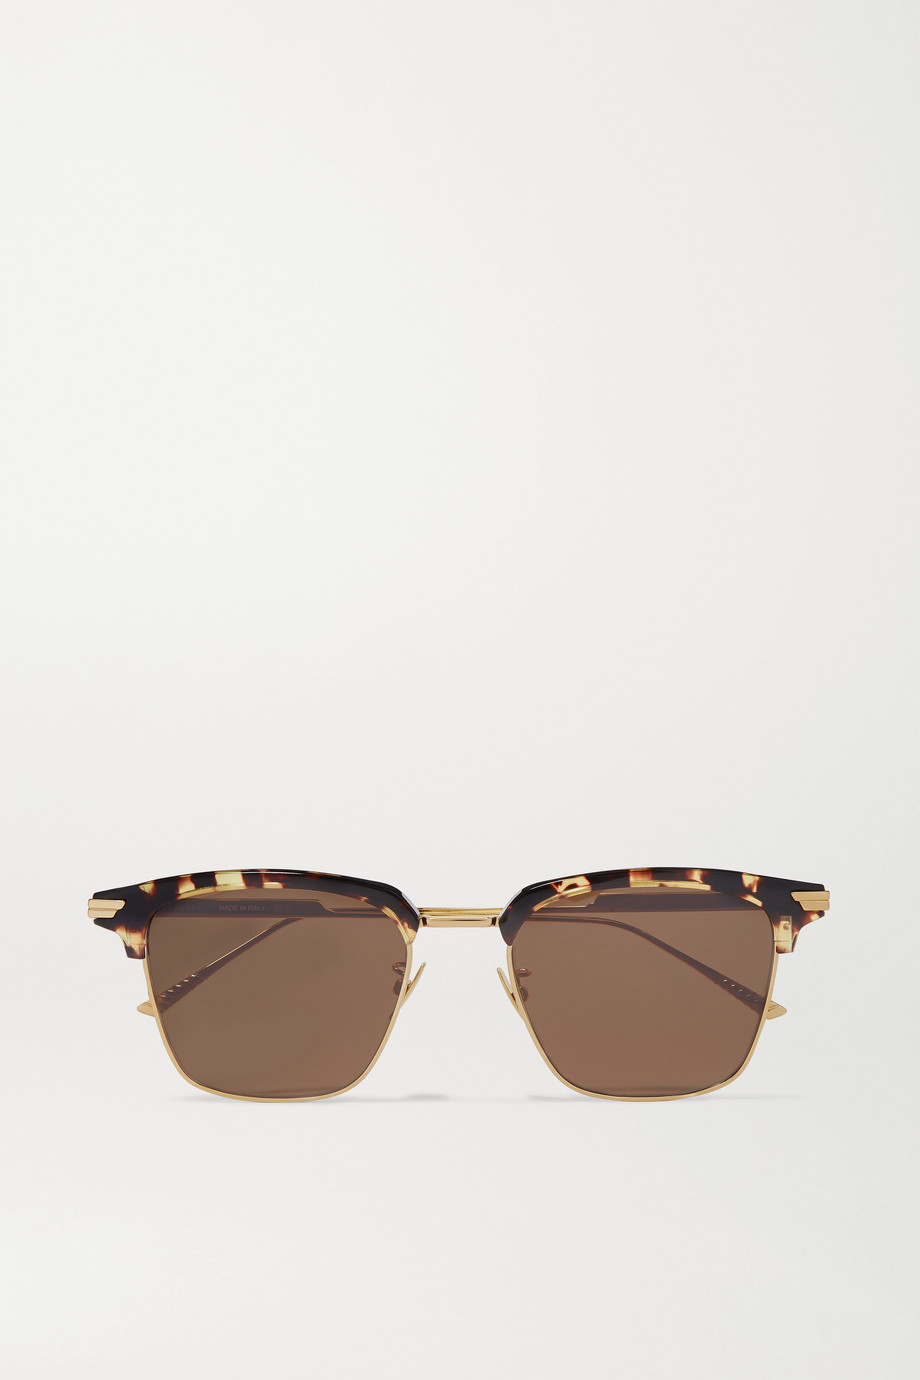 Bottega Veneta Light Ribbon goldfarbene Sonnenbrille mit eckigem Rahmen und Details aus Azetat in Hornoptik